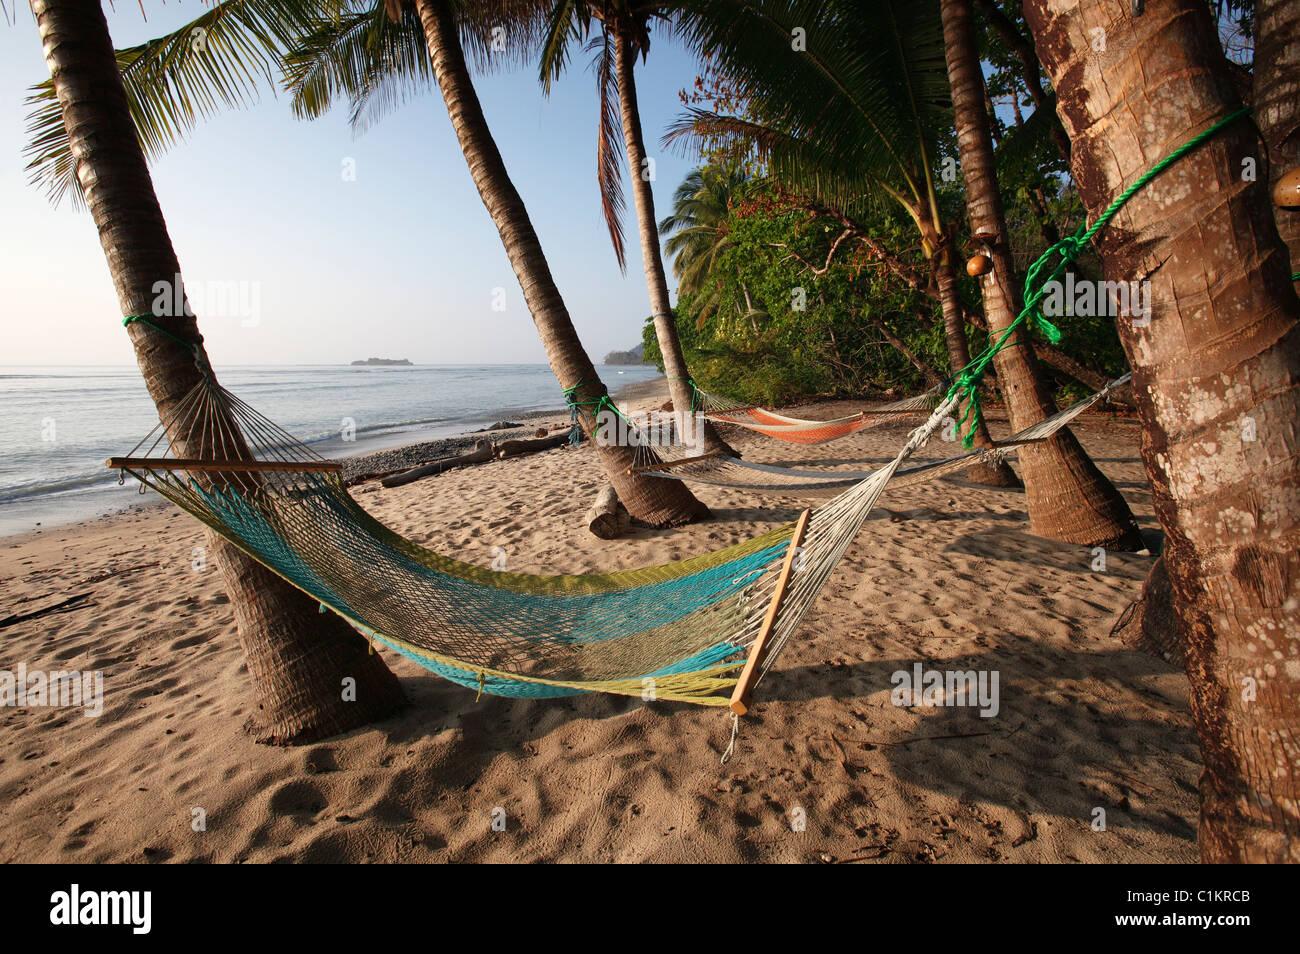 Hammocks under the palm trees on a tropical beach, Montezuma, Nicoya Peninsula, Costa Rica - Stock Image